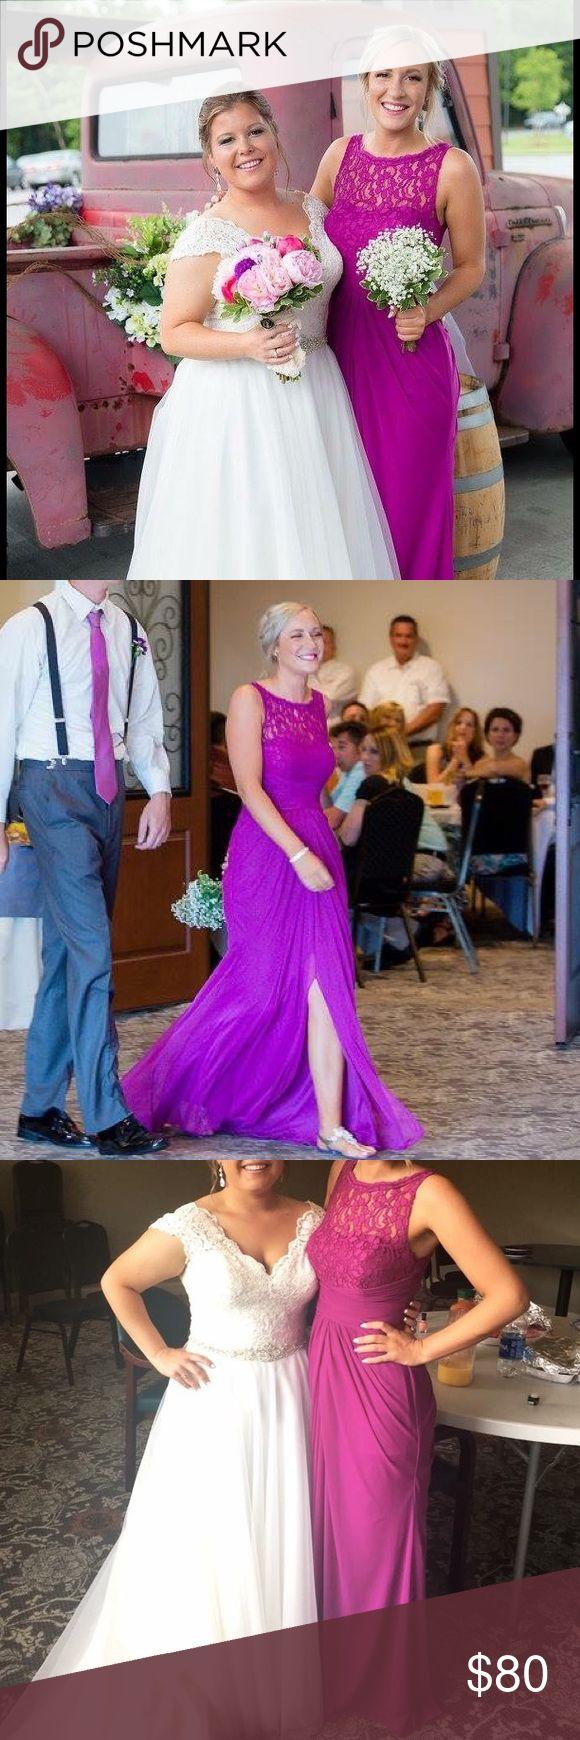 Raspberry Bridesmaid Dresses Wedding Gallery - Braidsmaid Dress ...